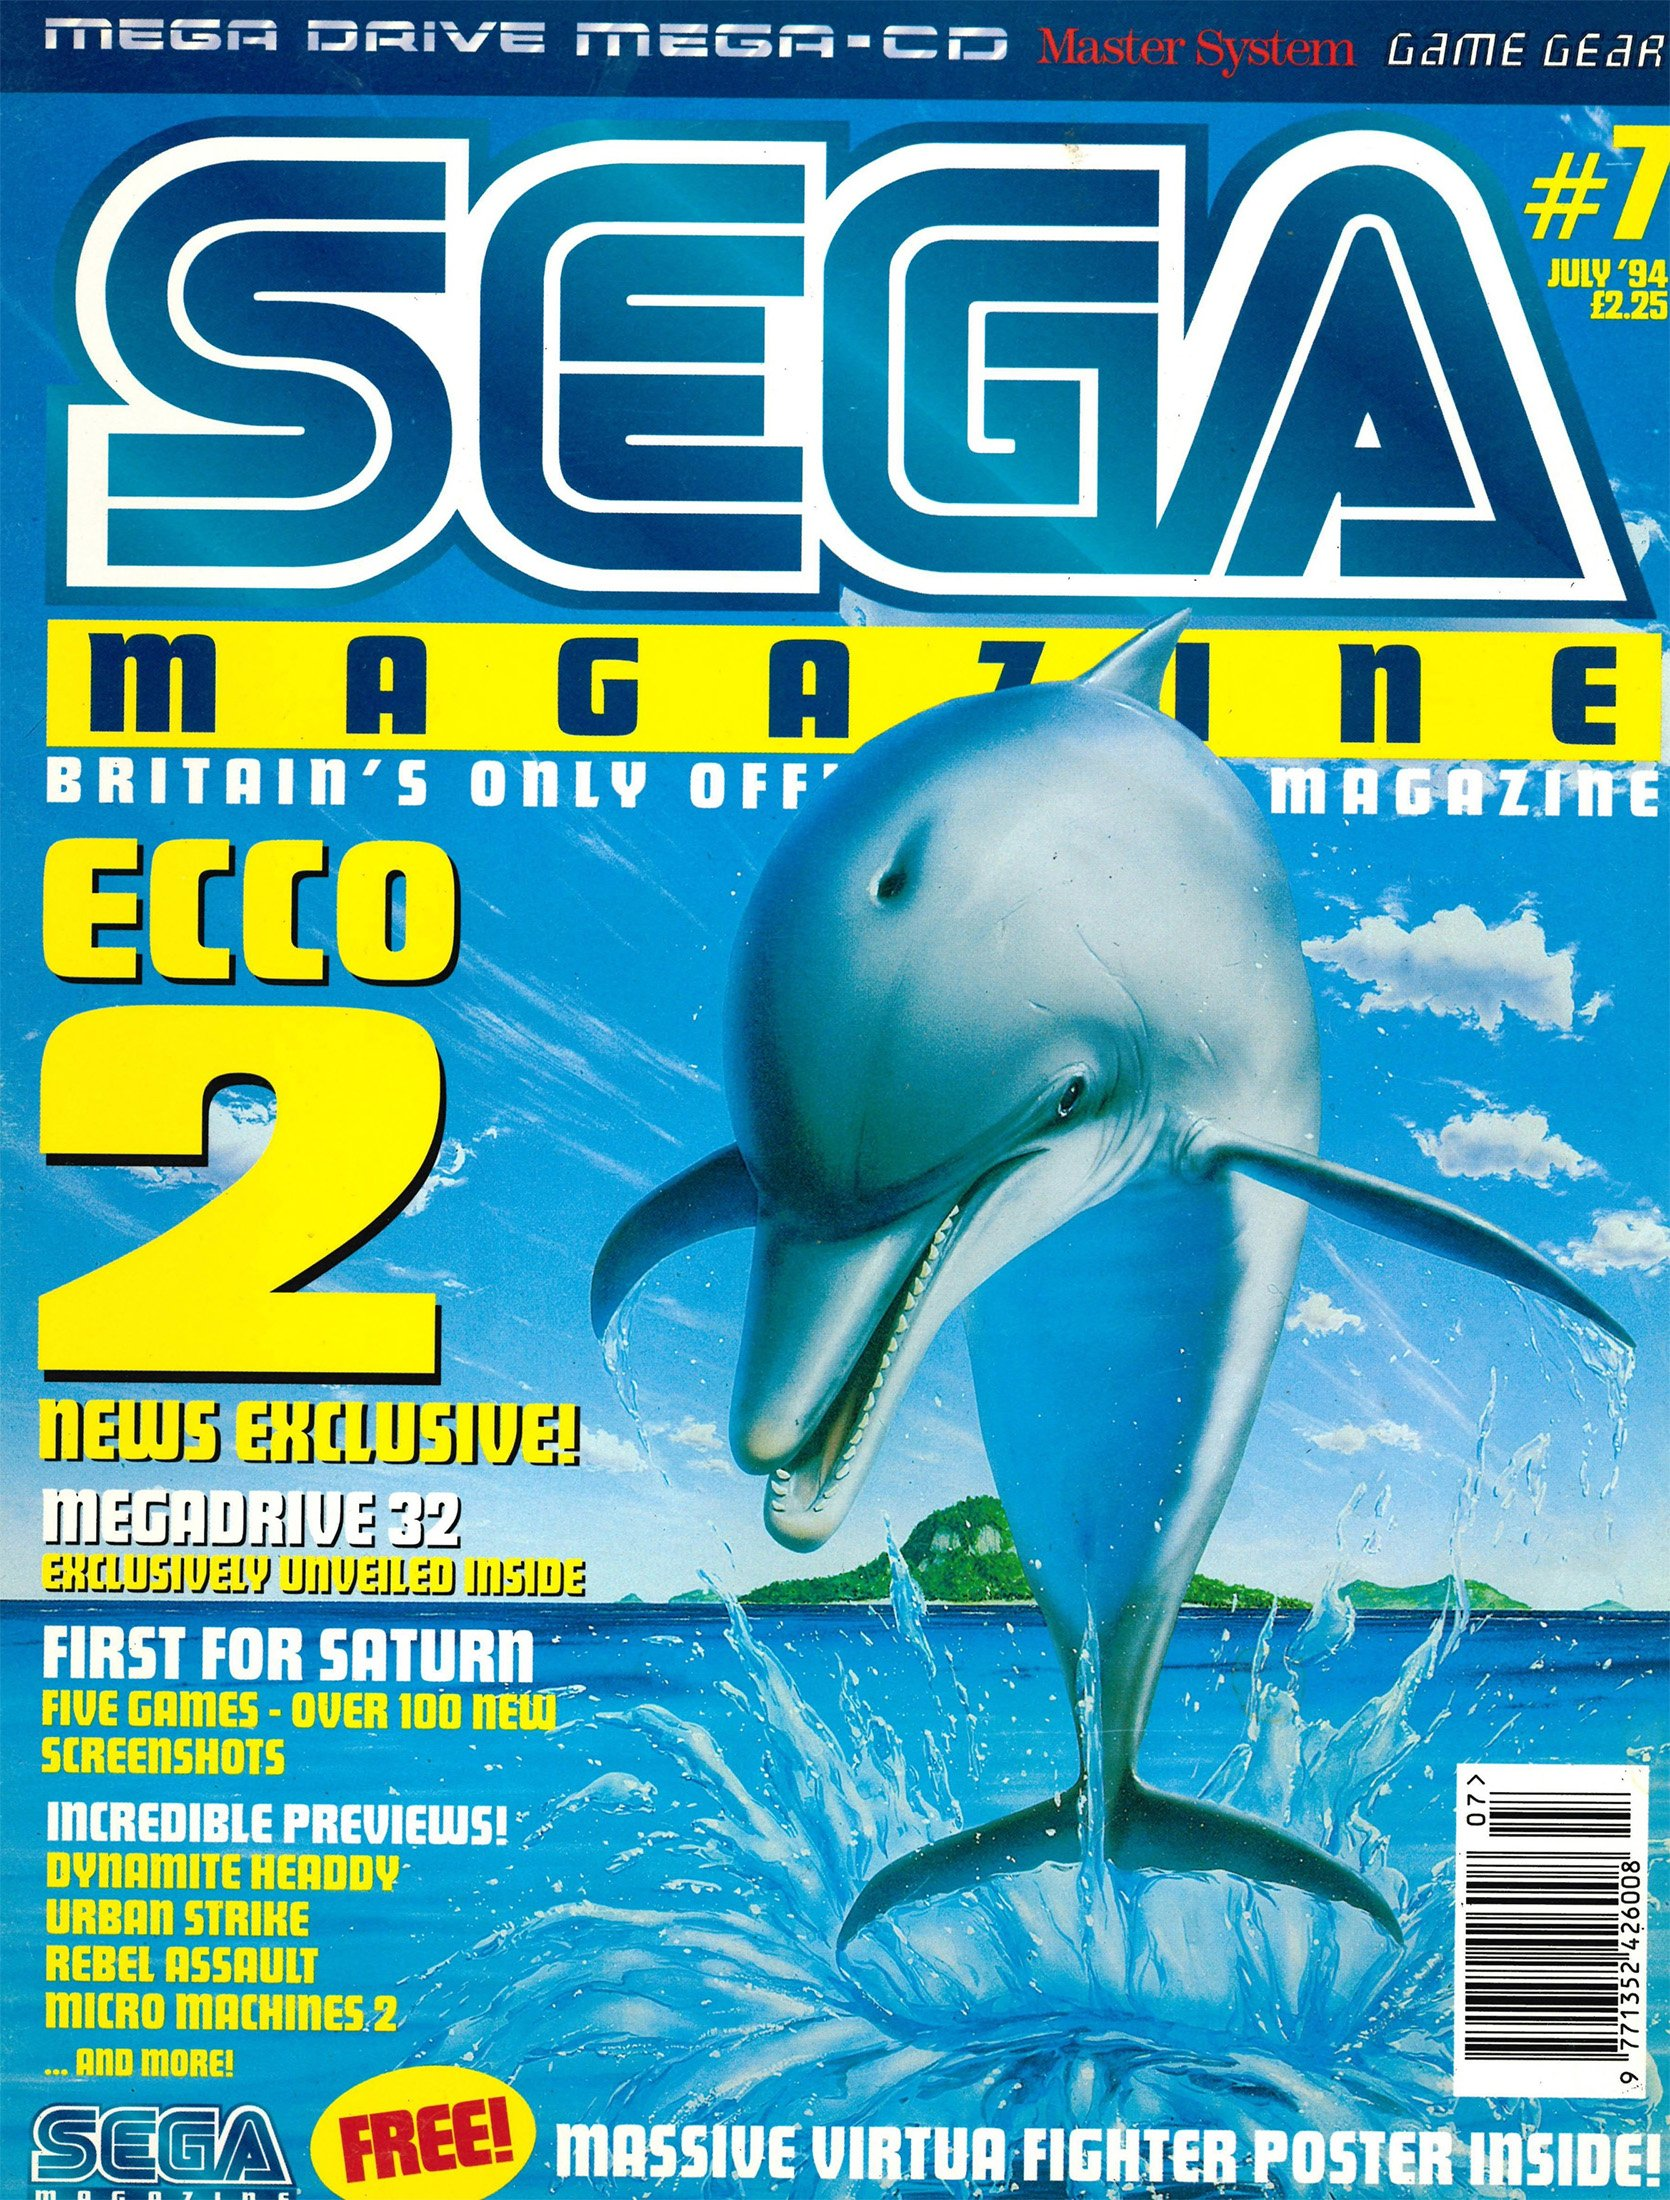 Sega Magazine 07 (July 1994)